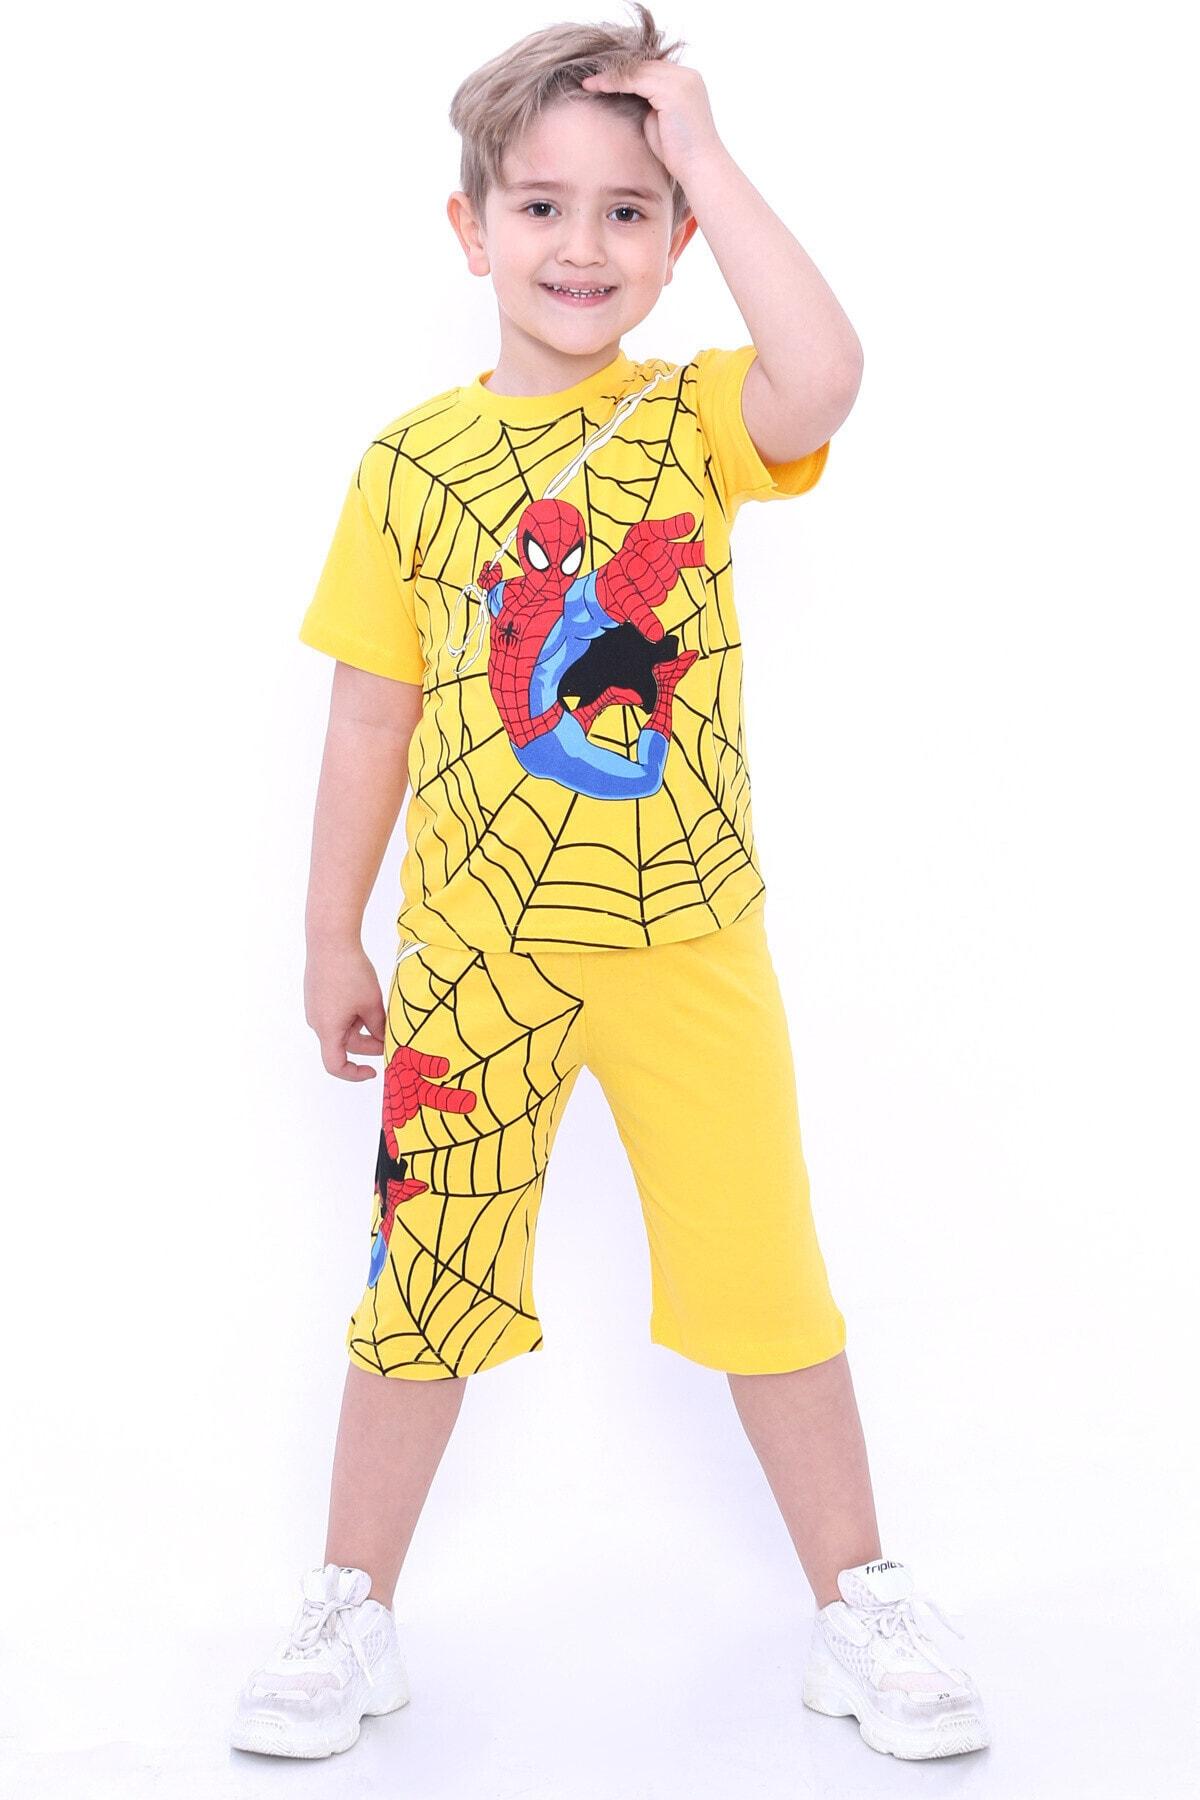 ست لباس بچه گانه اسپرت جدید برند Cansın Mini رنگ زرد ty97970168